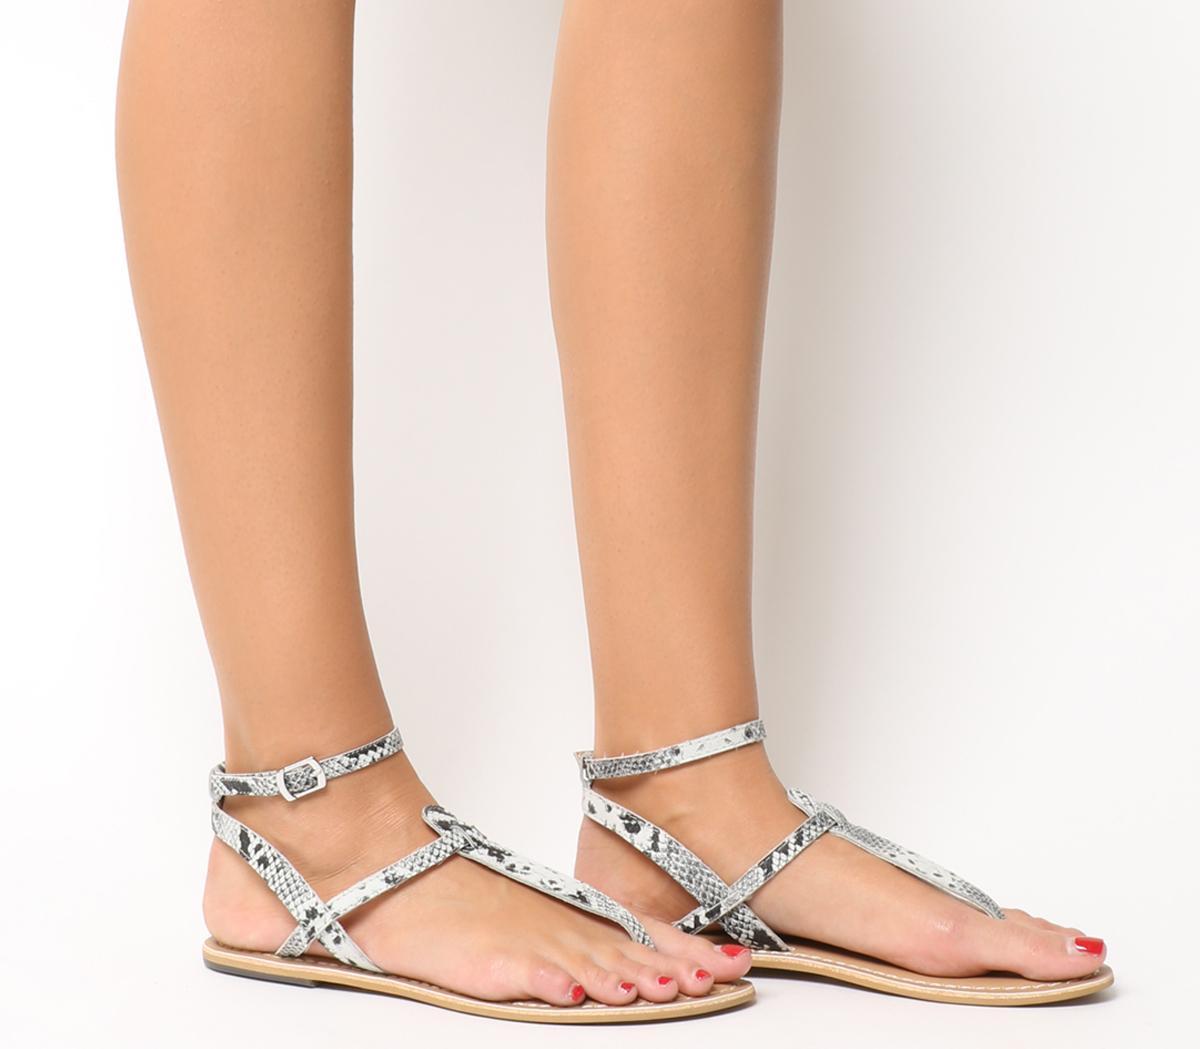 Salsa Ankle Strap Toe Post Sandals